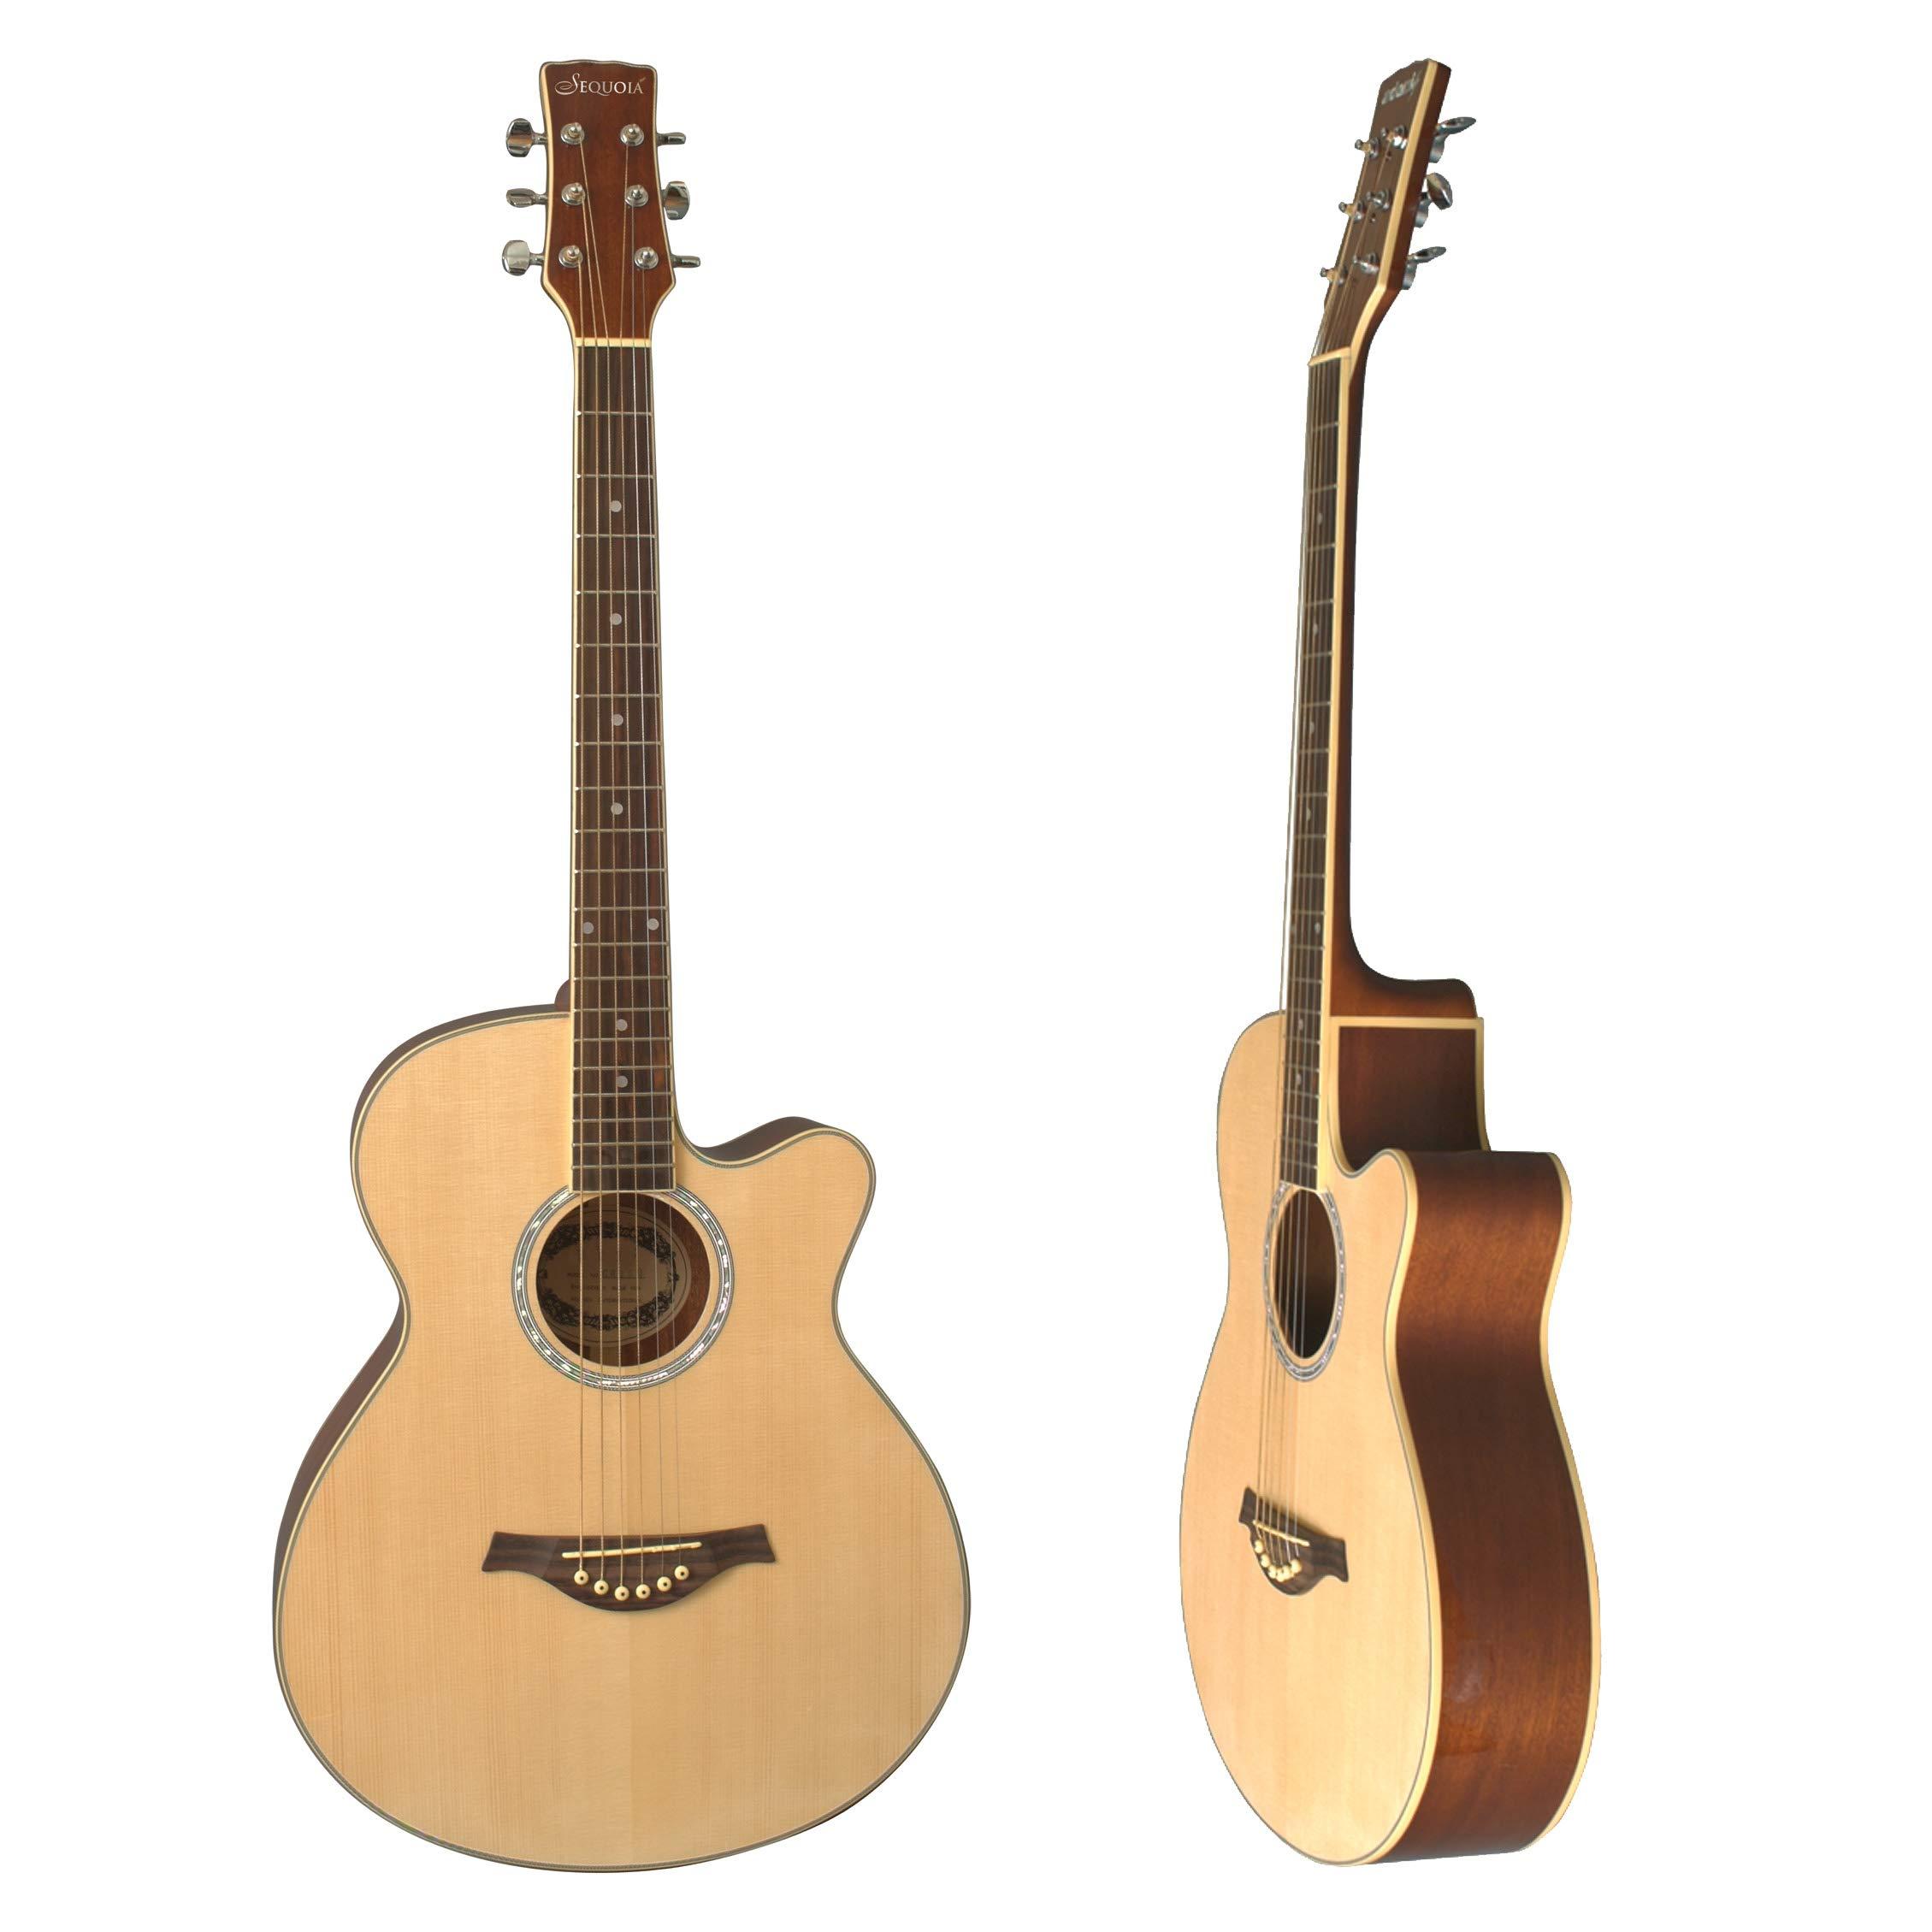 eMedia aprender a tocar la guitarra Pack: Amazon.es: Instrumentos musicales